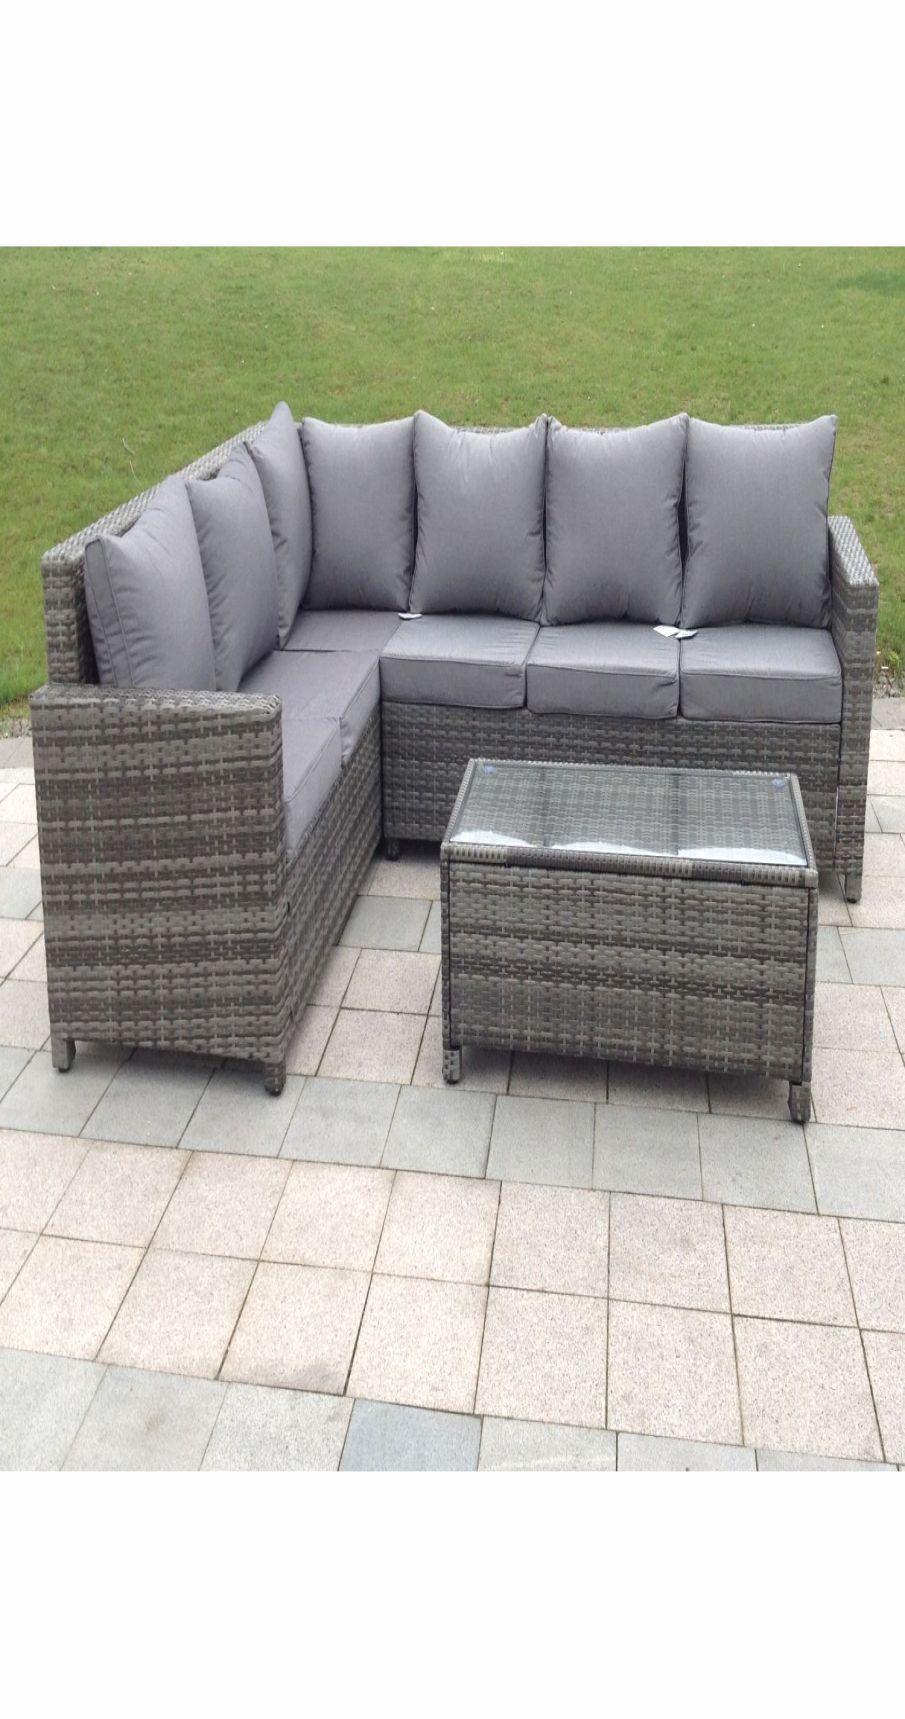 Unique Grey Rattan Garden sofa in 9  Furniture sofa set